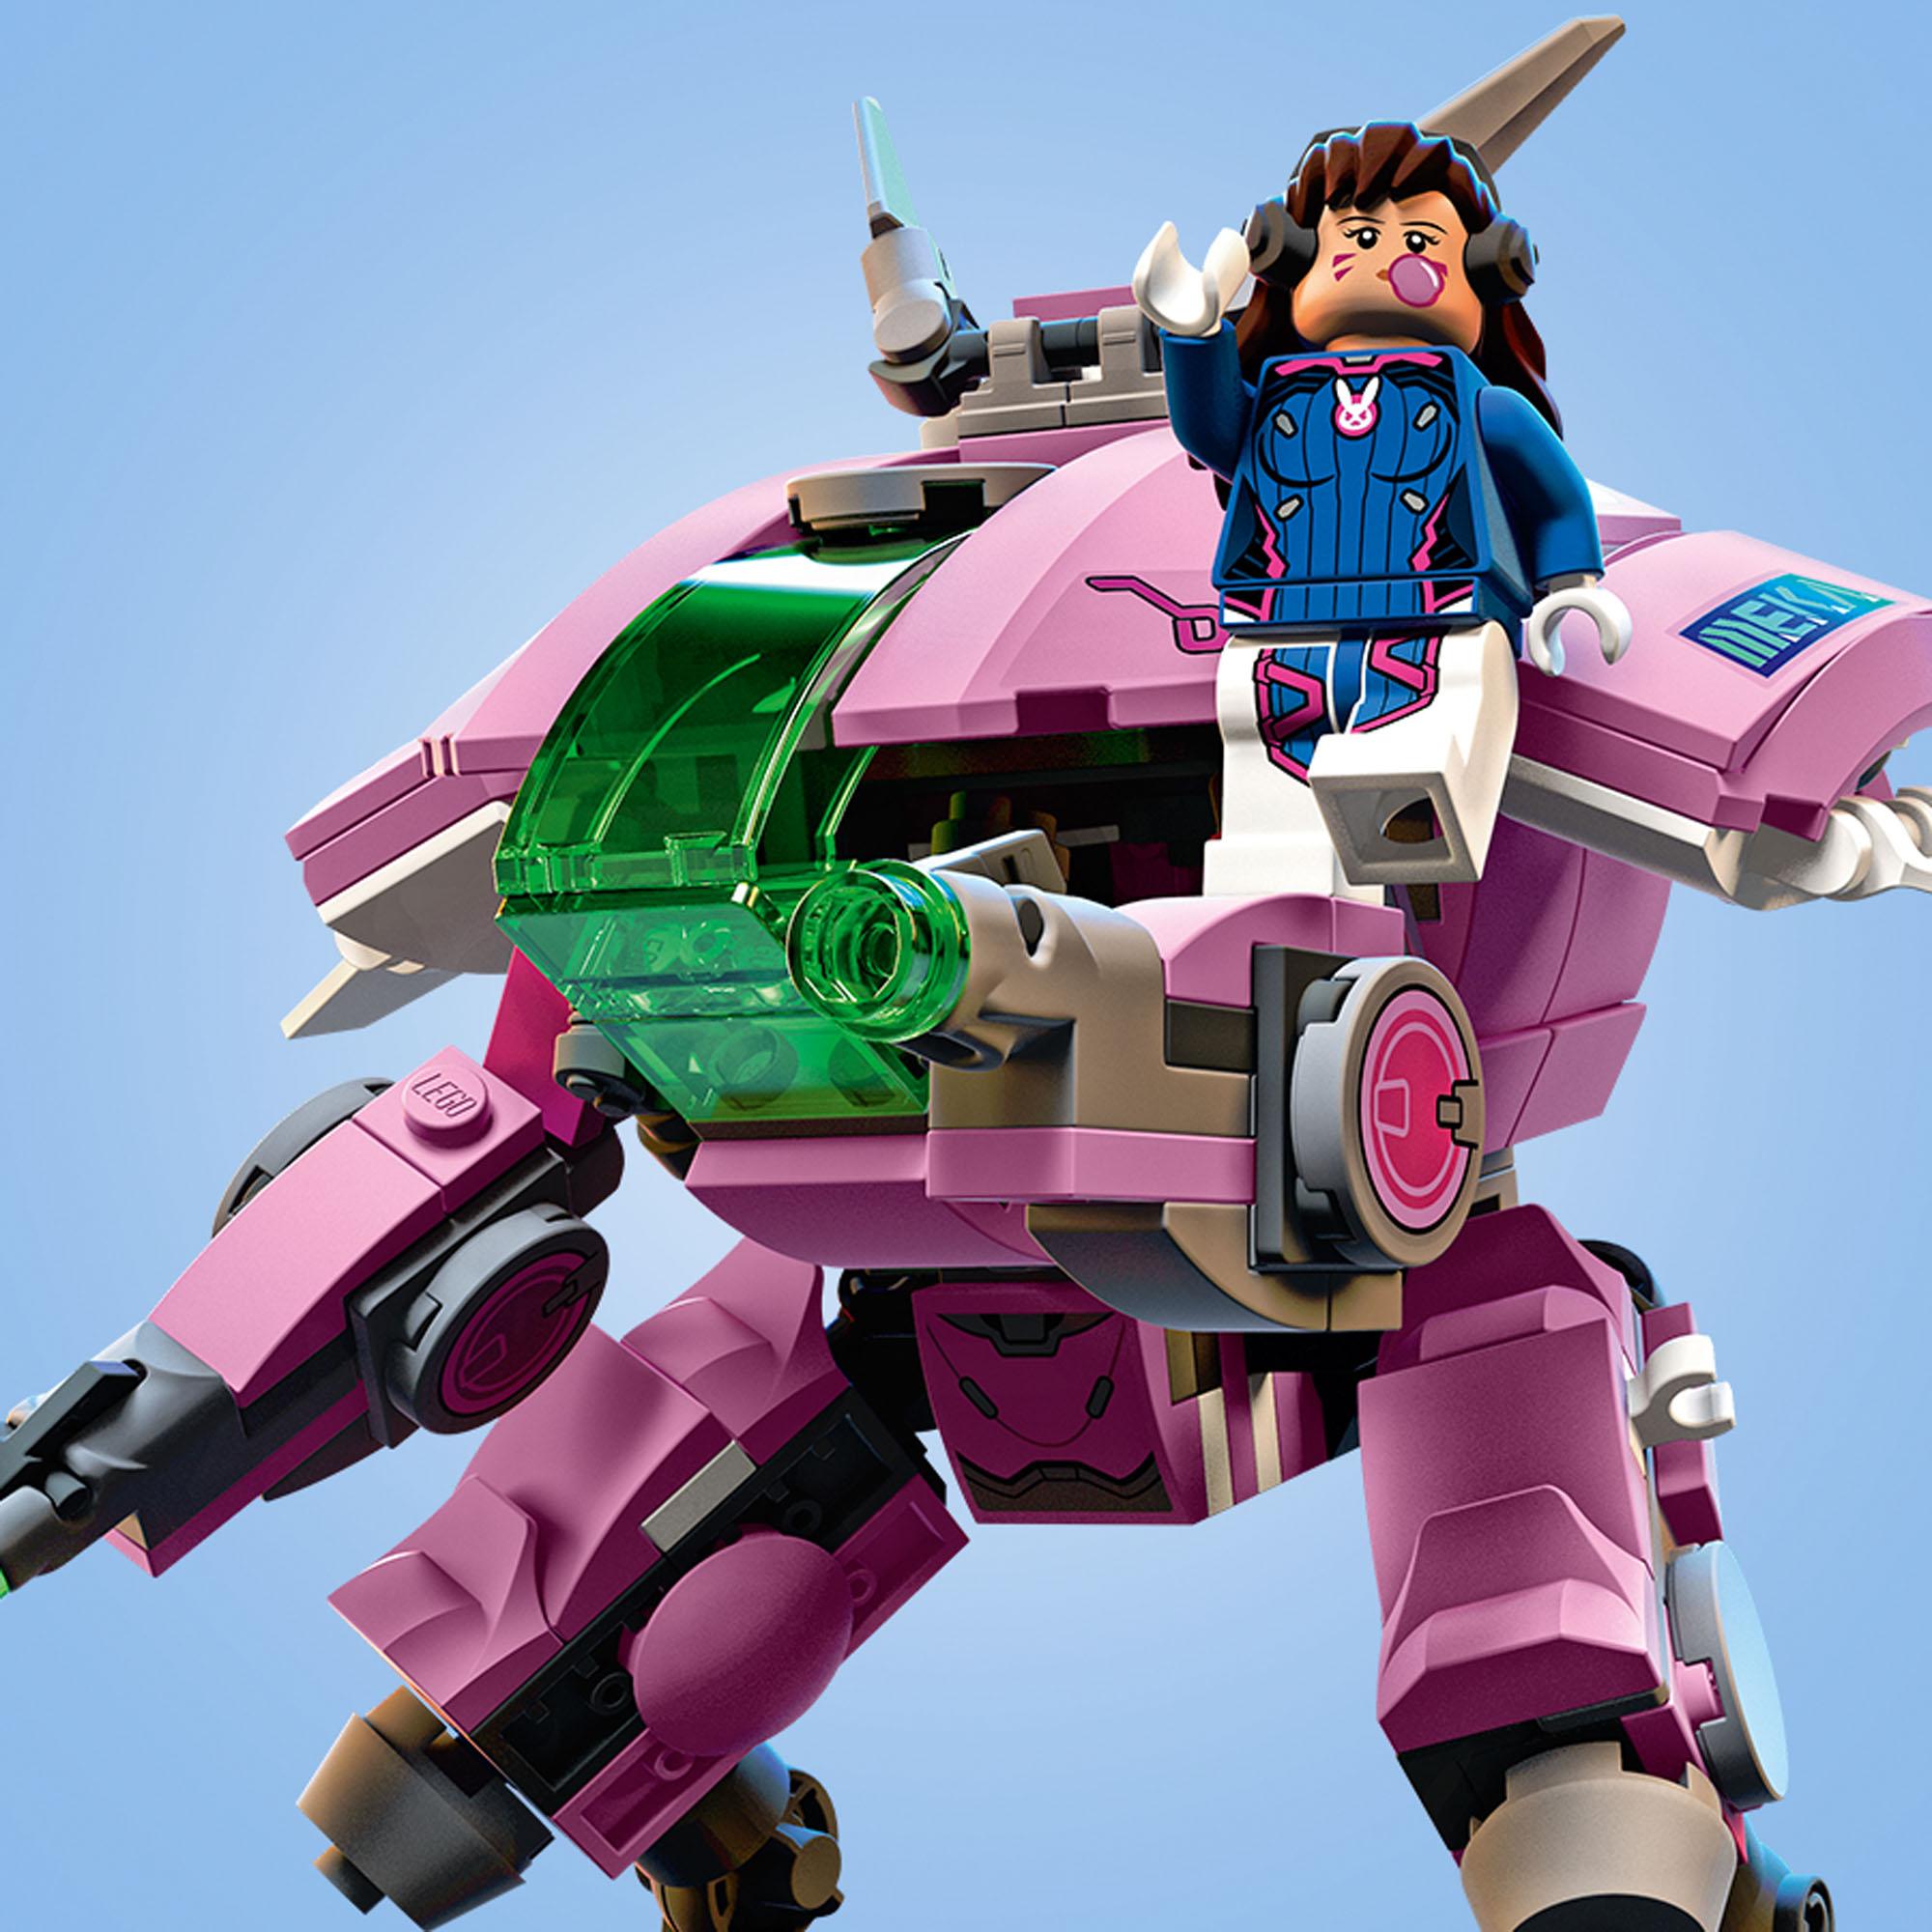 75973 LEGO Overwatch D.Va & Reinhardt Buildable Mech Suit ...